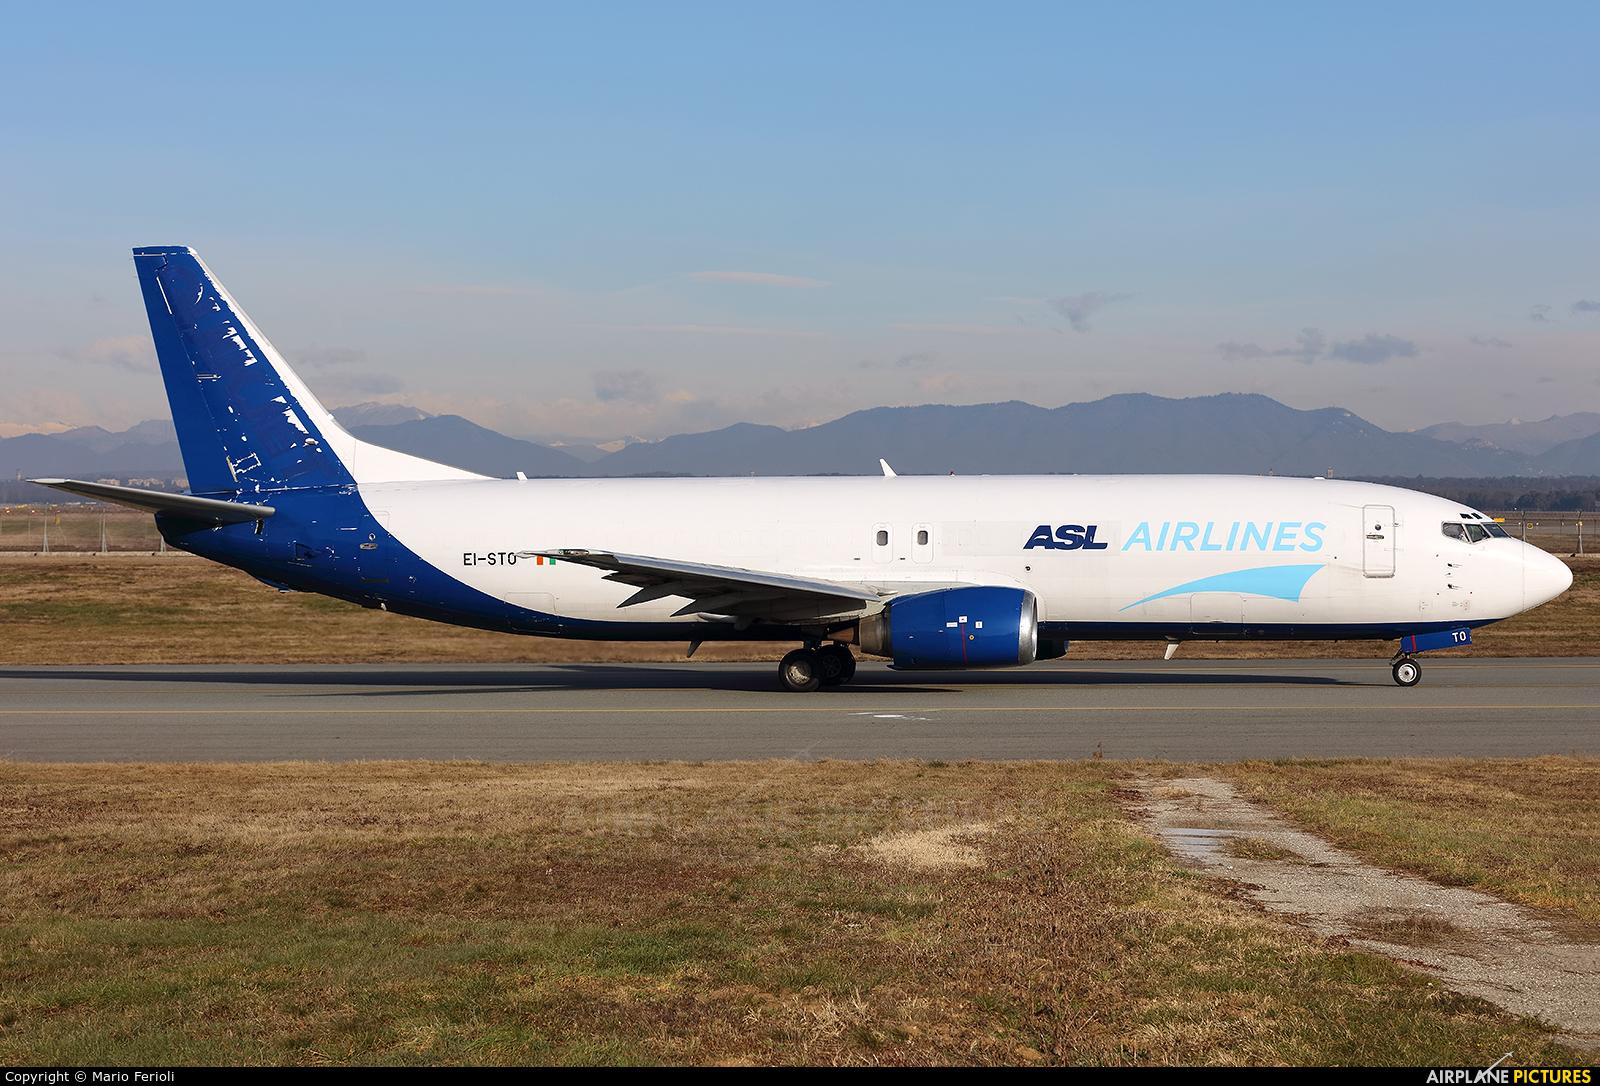 ASL Airlines EI-STO aircraft at Milan - Malpensa